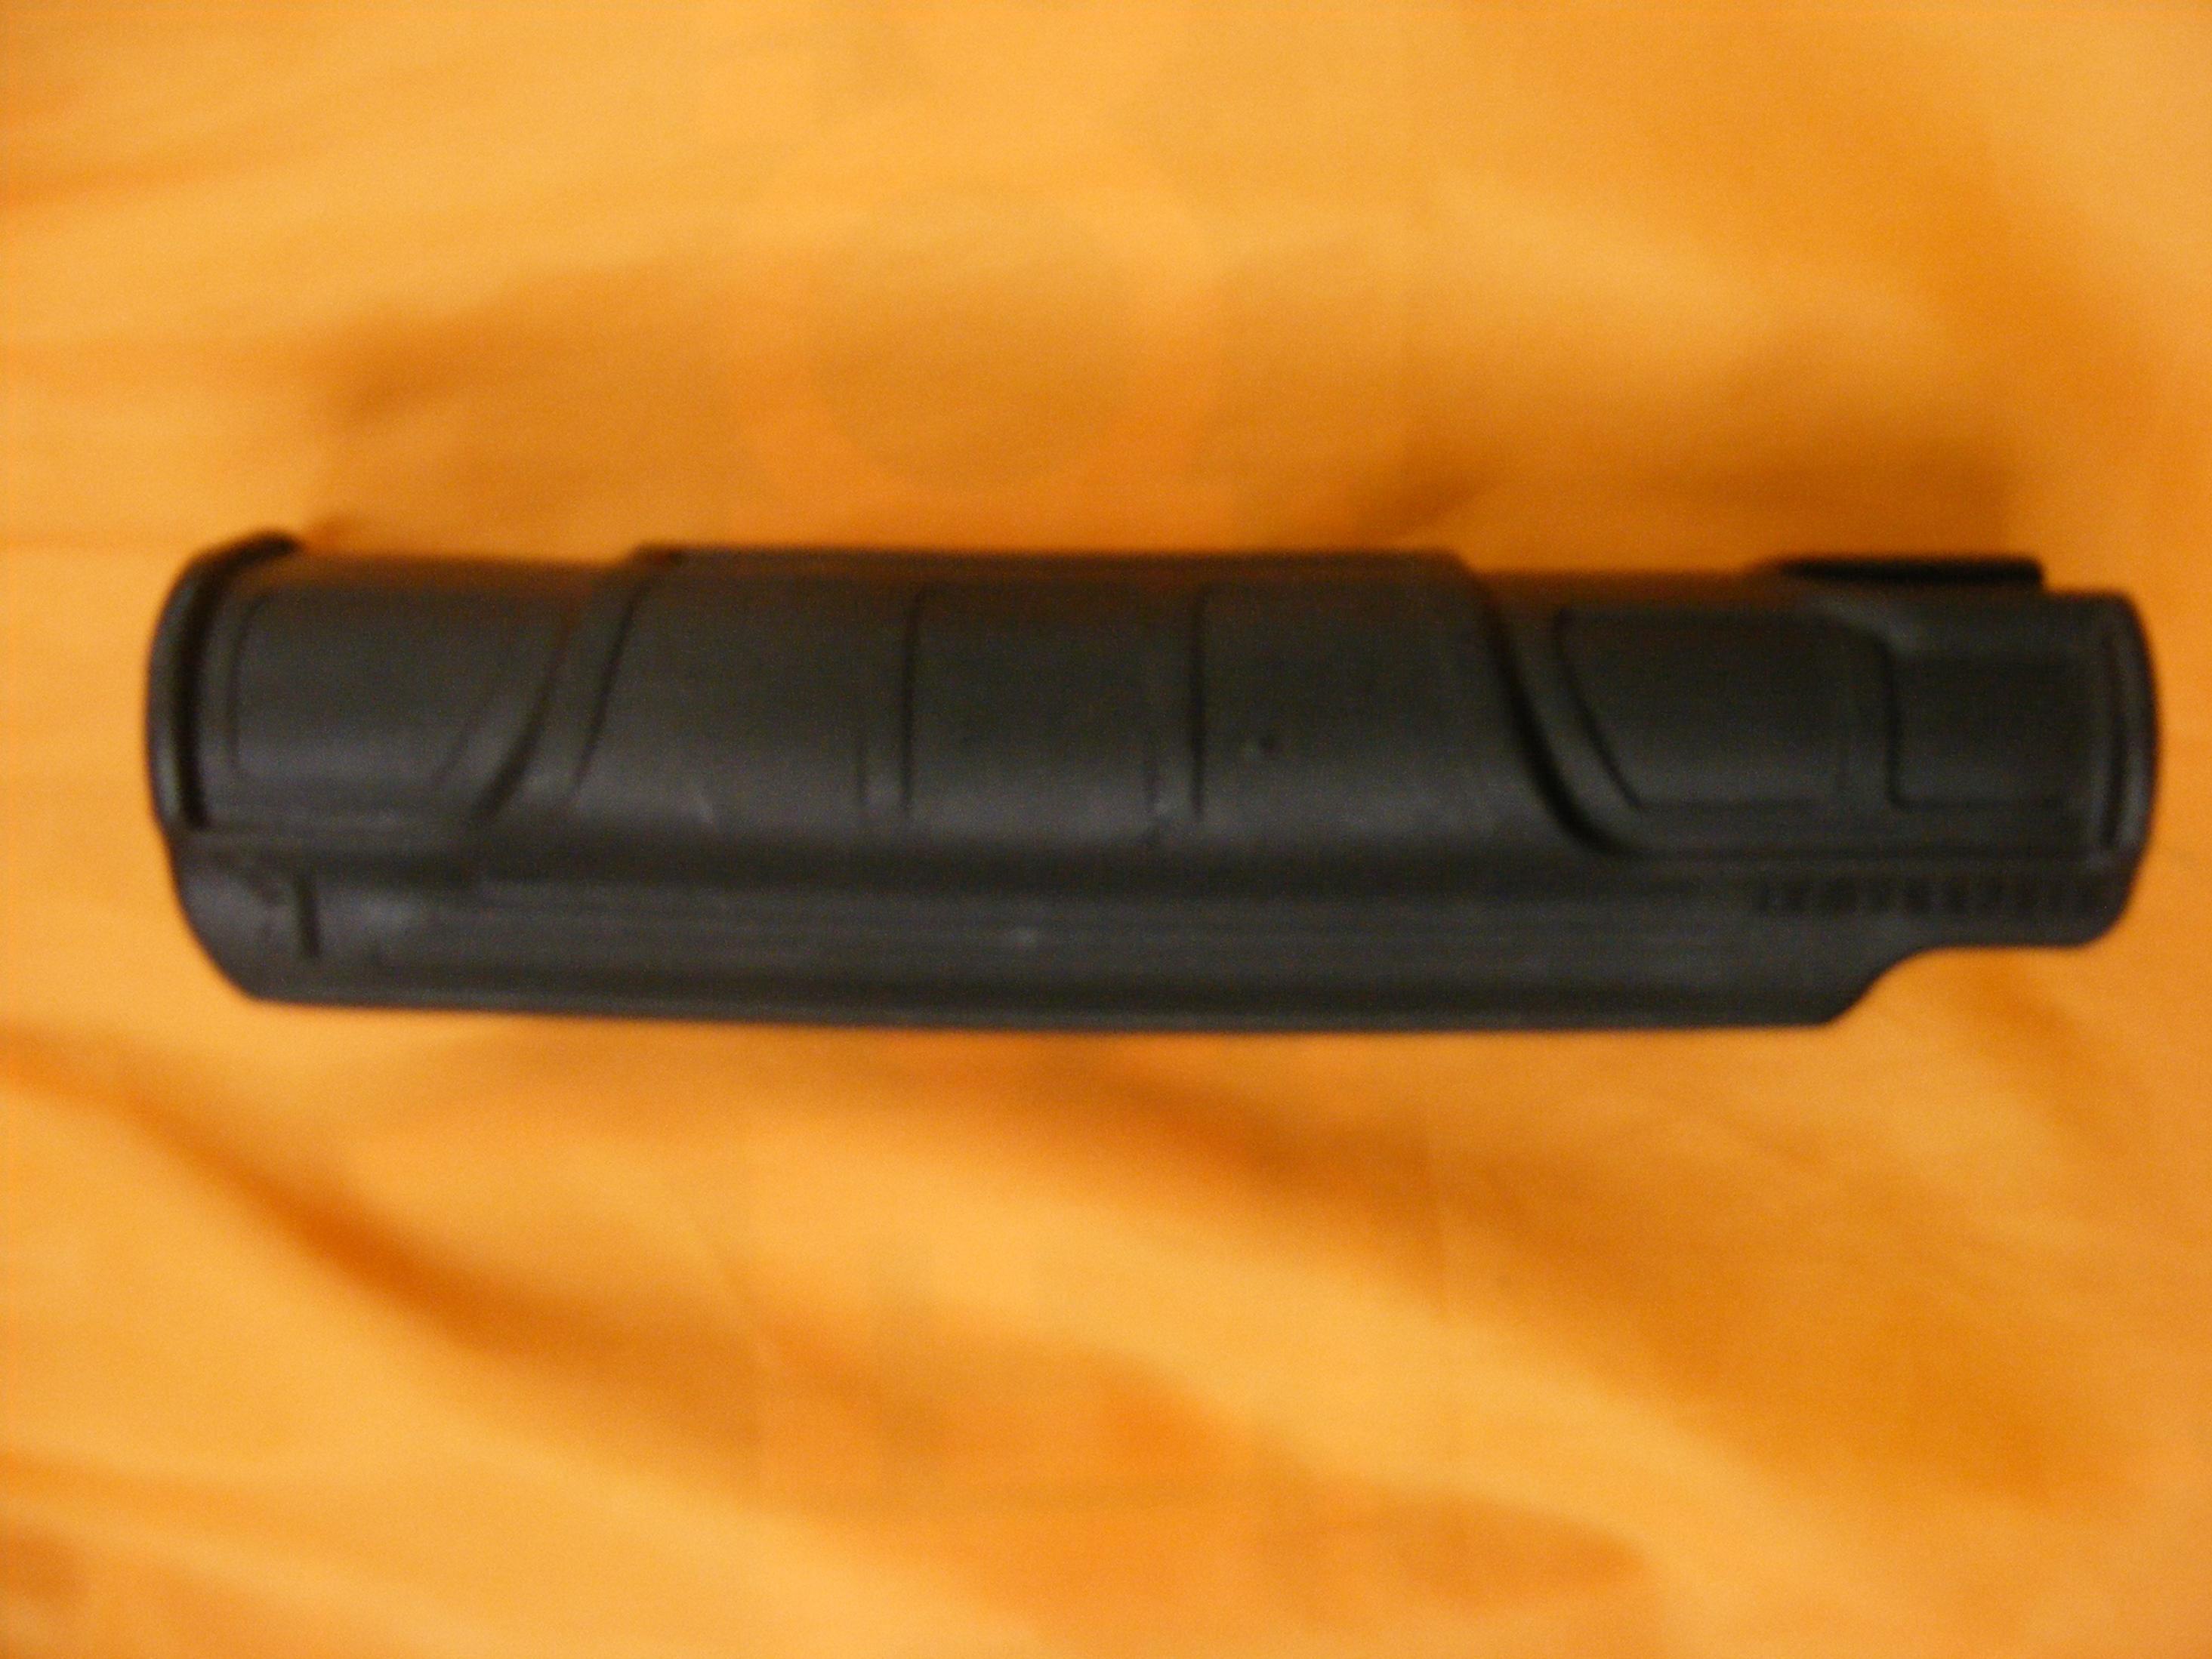 WTS: Black Powder Pistol and various gun items-sale-006.jpg